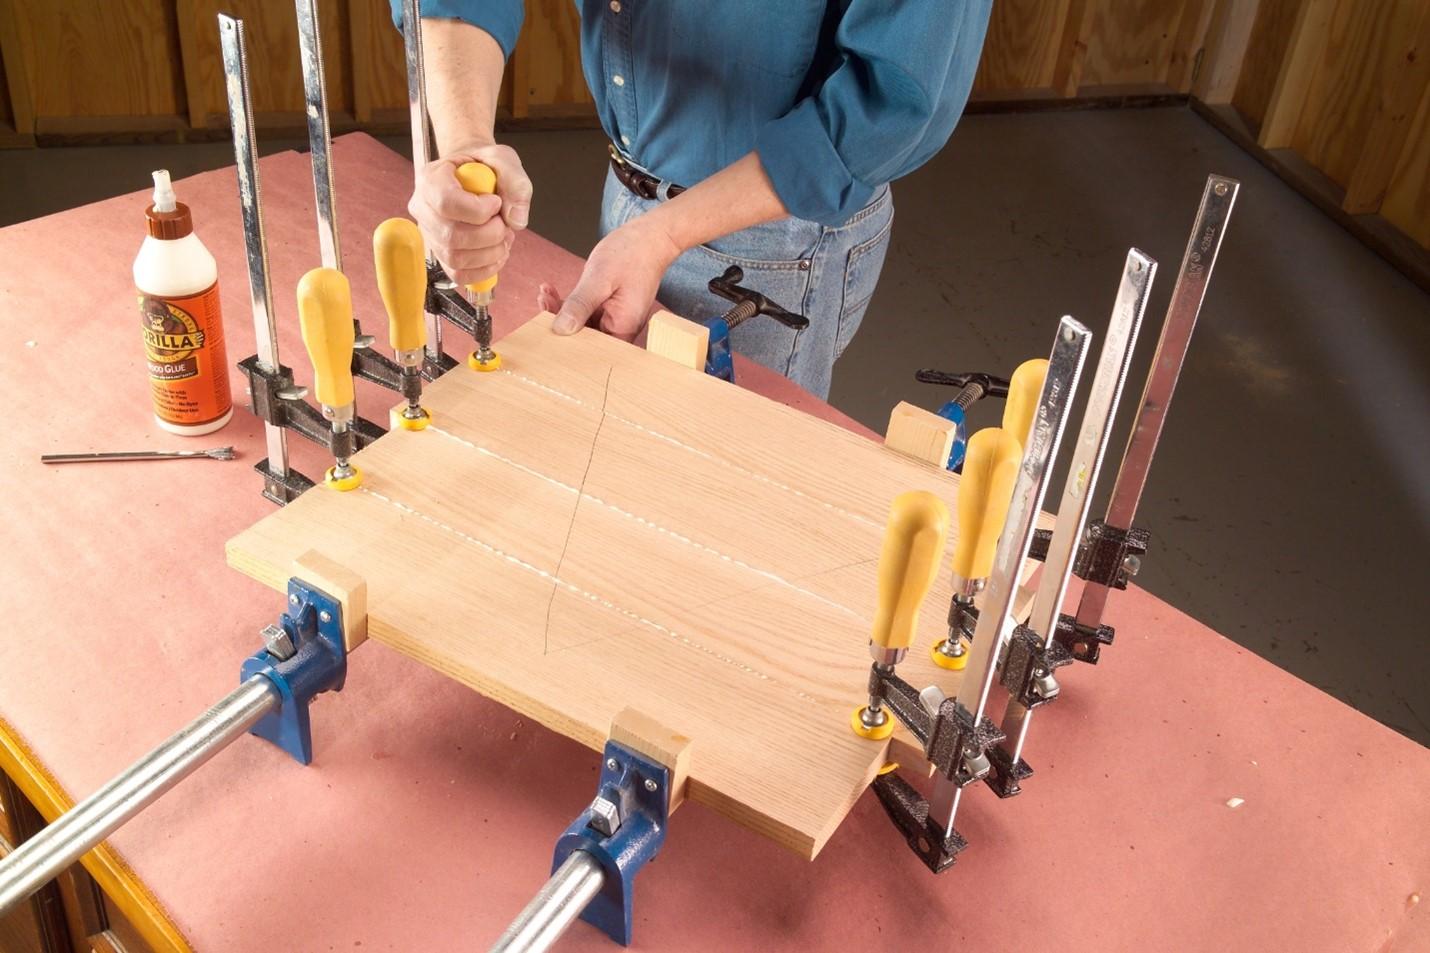 how to put together edge to edge glue ups